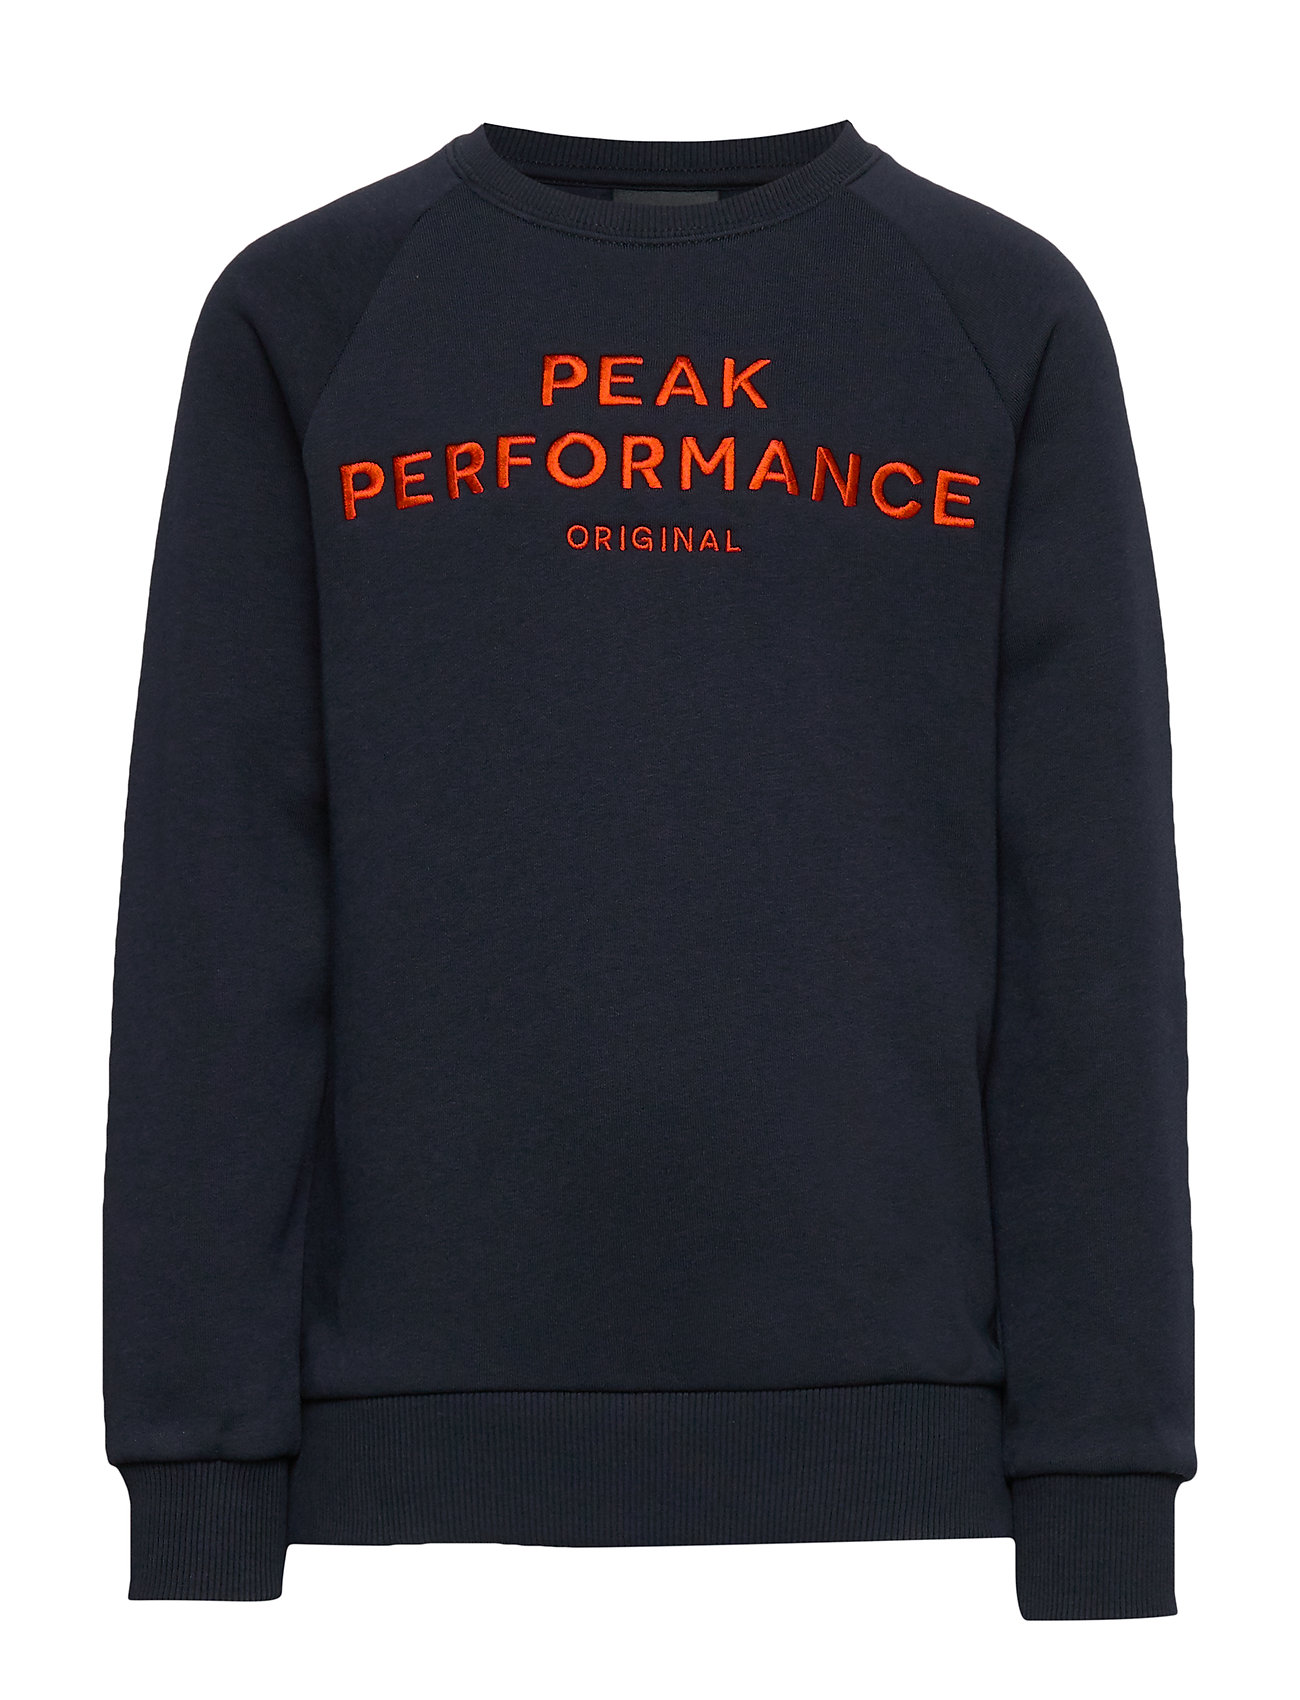 Peak Performance JR ORIGC - SALUTE BLUE